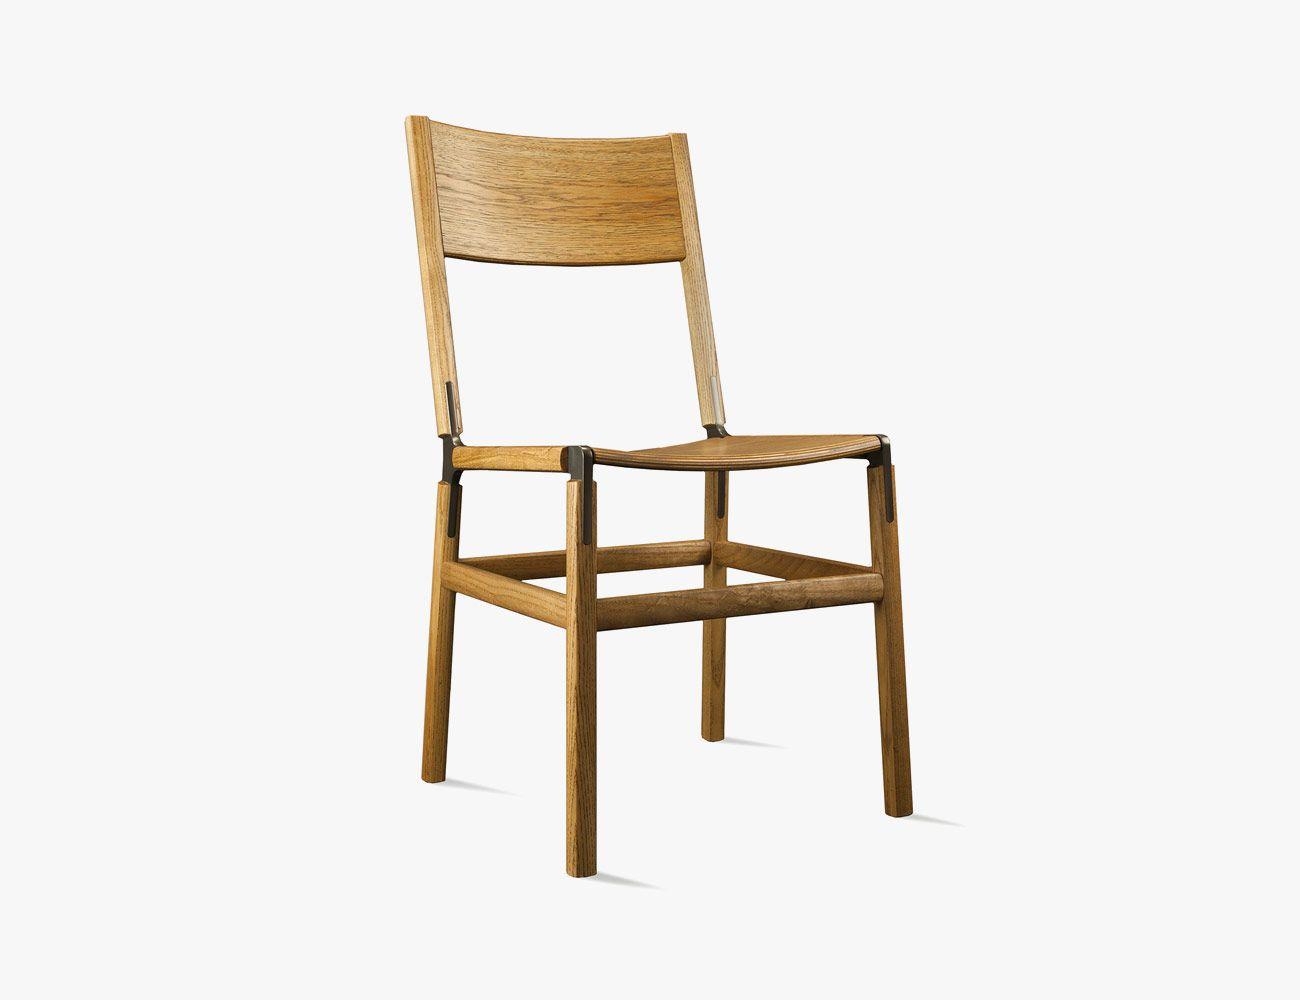 Phenomenal 3 Flat Pack Furniture Brands To Know Gear Patrol Machost Co Dining Chair Design Ideas Machostcouk